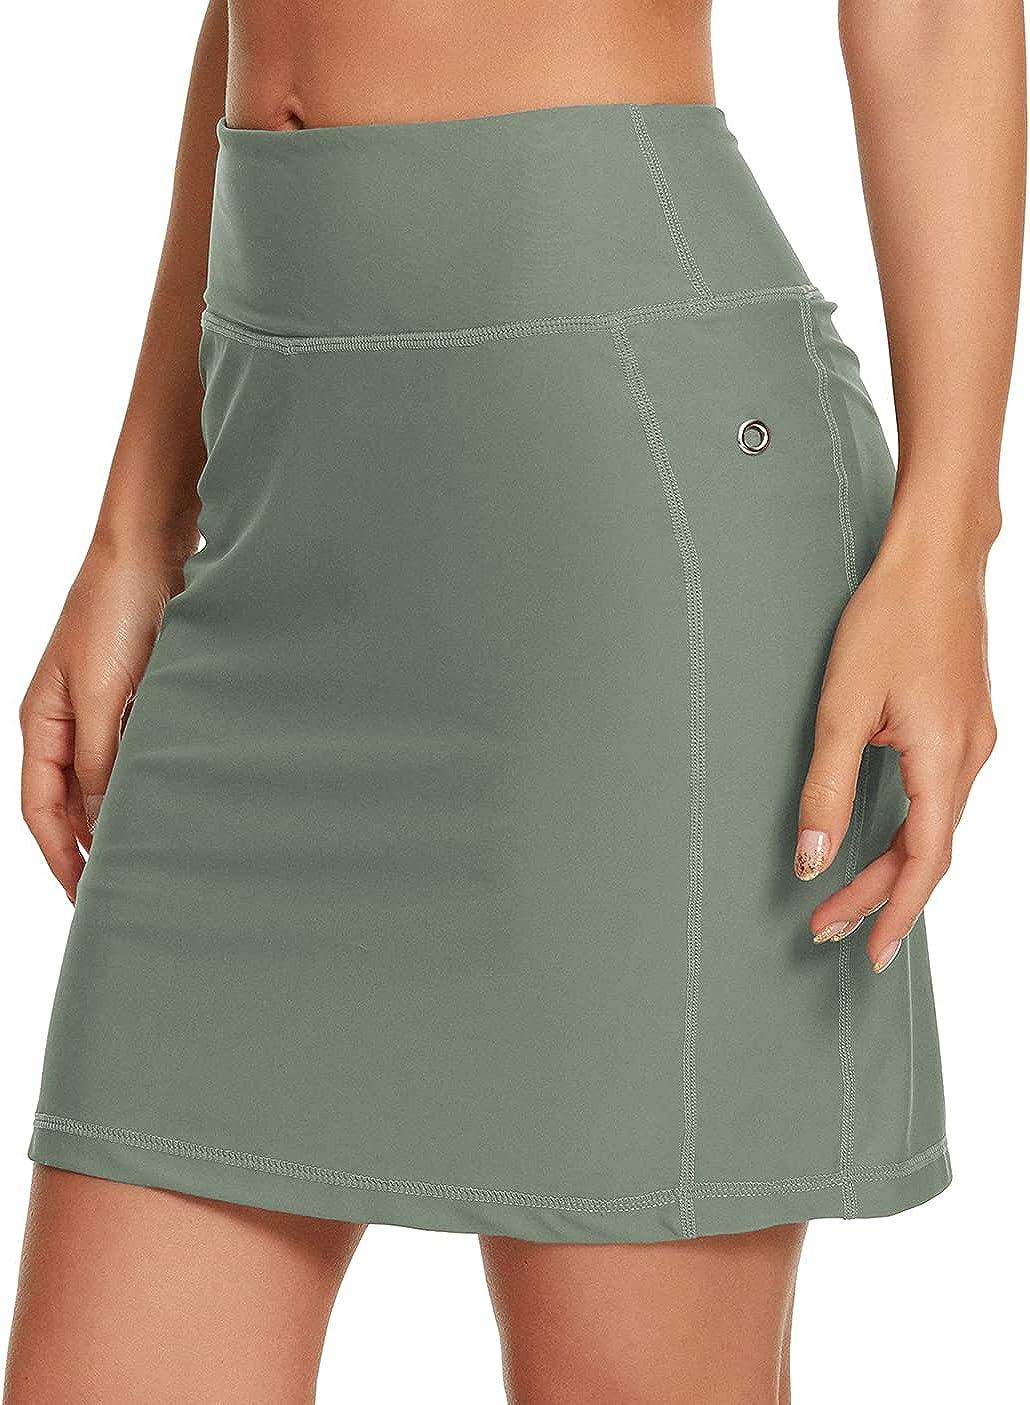 Spasm price Mounblun Women's Active Athletic Skort Skirt favorite Tennis Lightweight